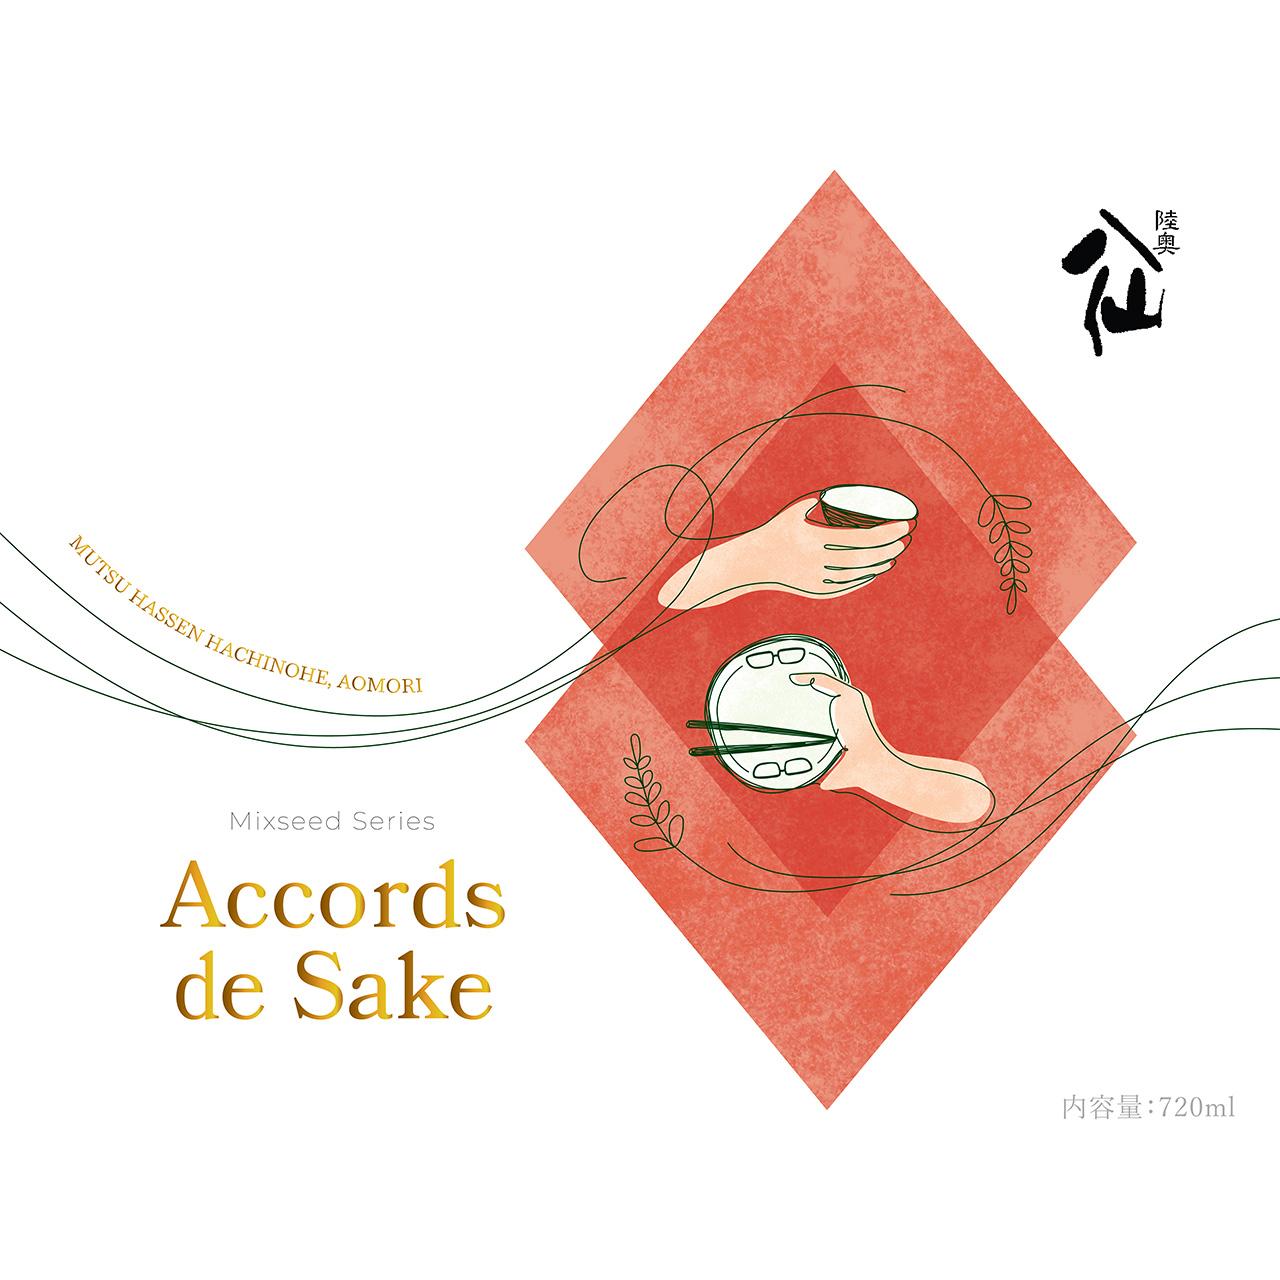 Mixseed Series Accords de Sake 食中酒